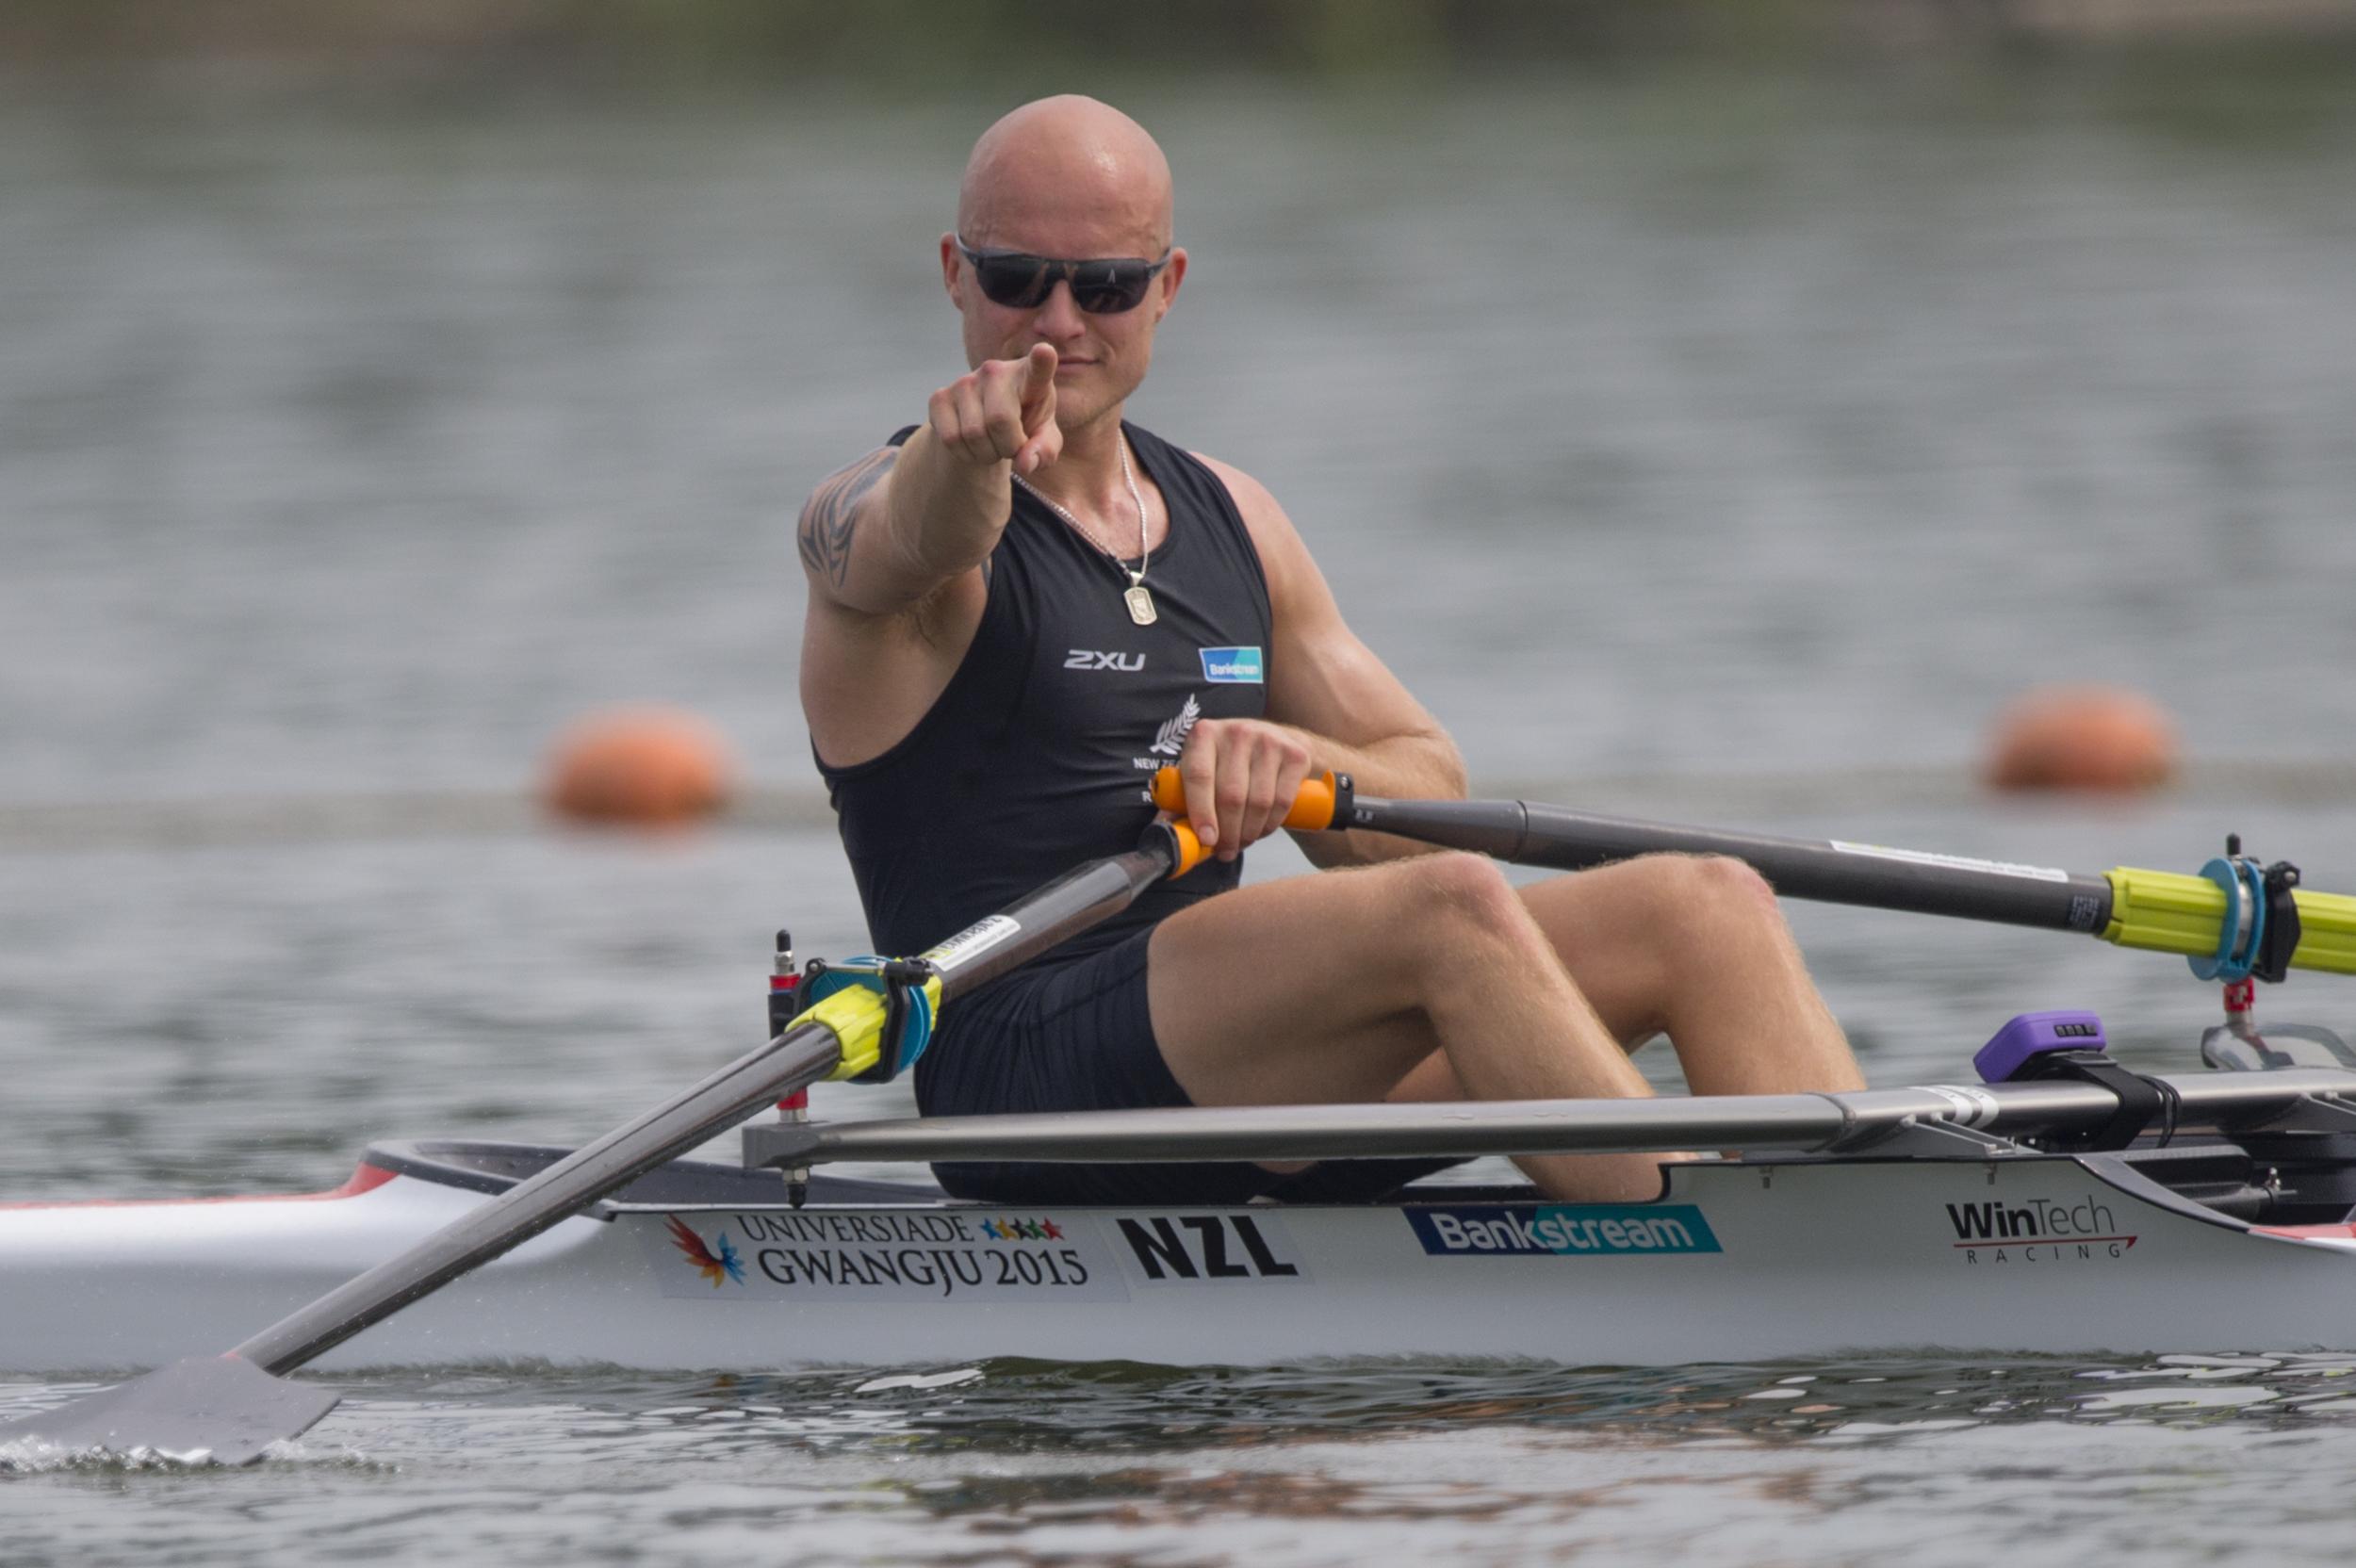 Toby Cunliffe-Steel - 2015 World University Games - Semi final - Photo © Rowing Celebration (1).jpg